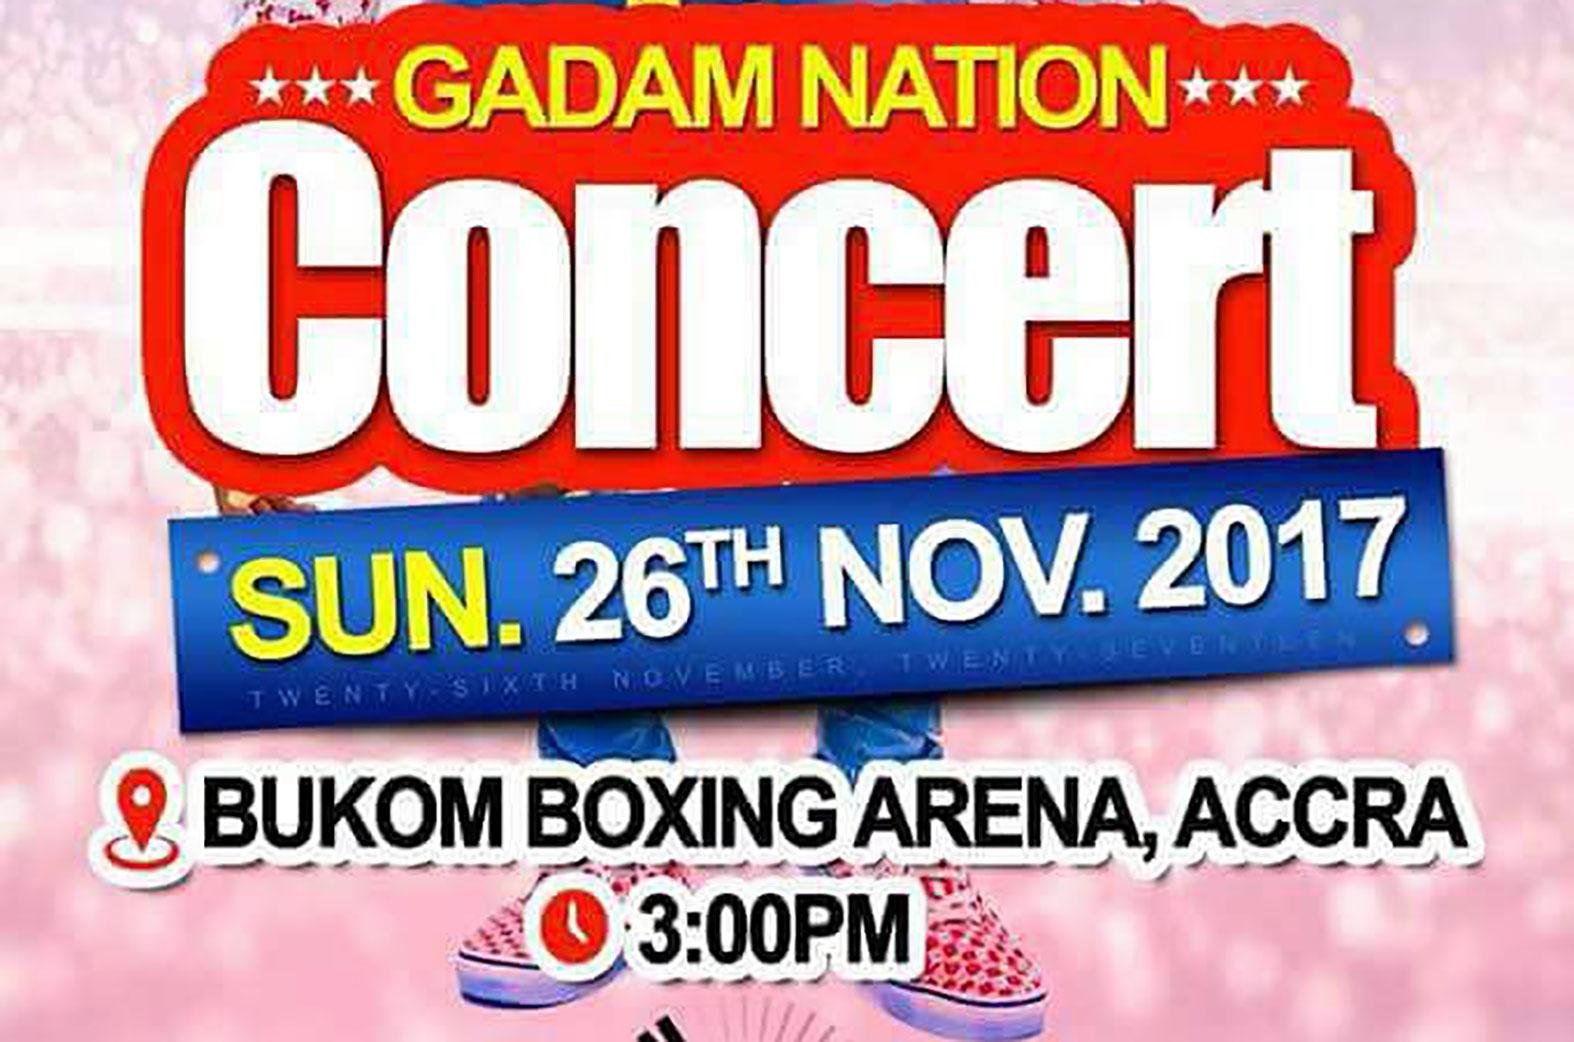 Gadam Nation concert